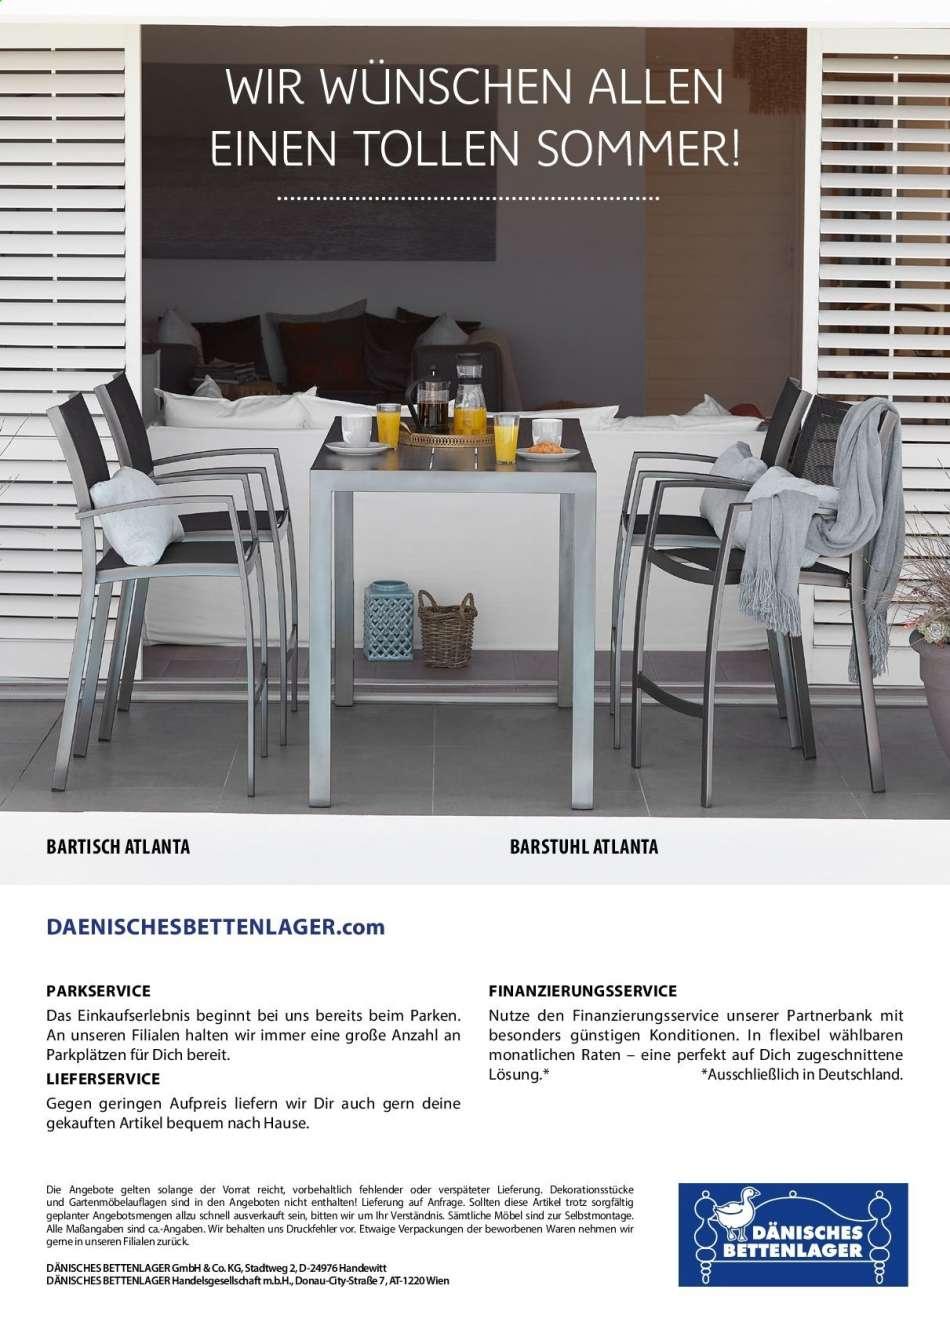 Full Size of Bartisch Dänisches Bettenlager Dnisches Aktuelle Prospekte Rabatt Kompass Küche Badezimmer Wohnzimmer Bartisch Dänisches Bettenlager